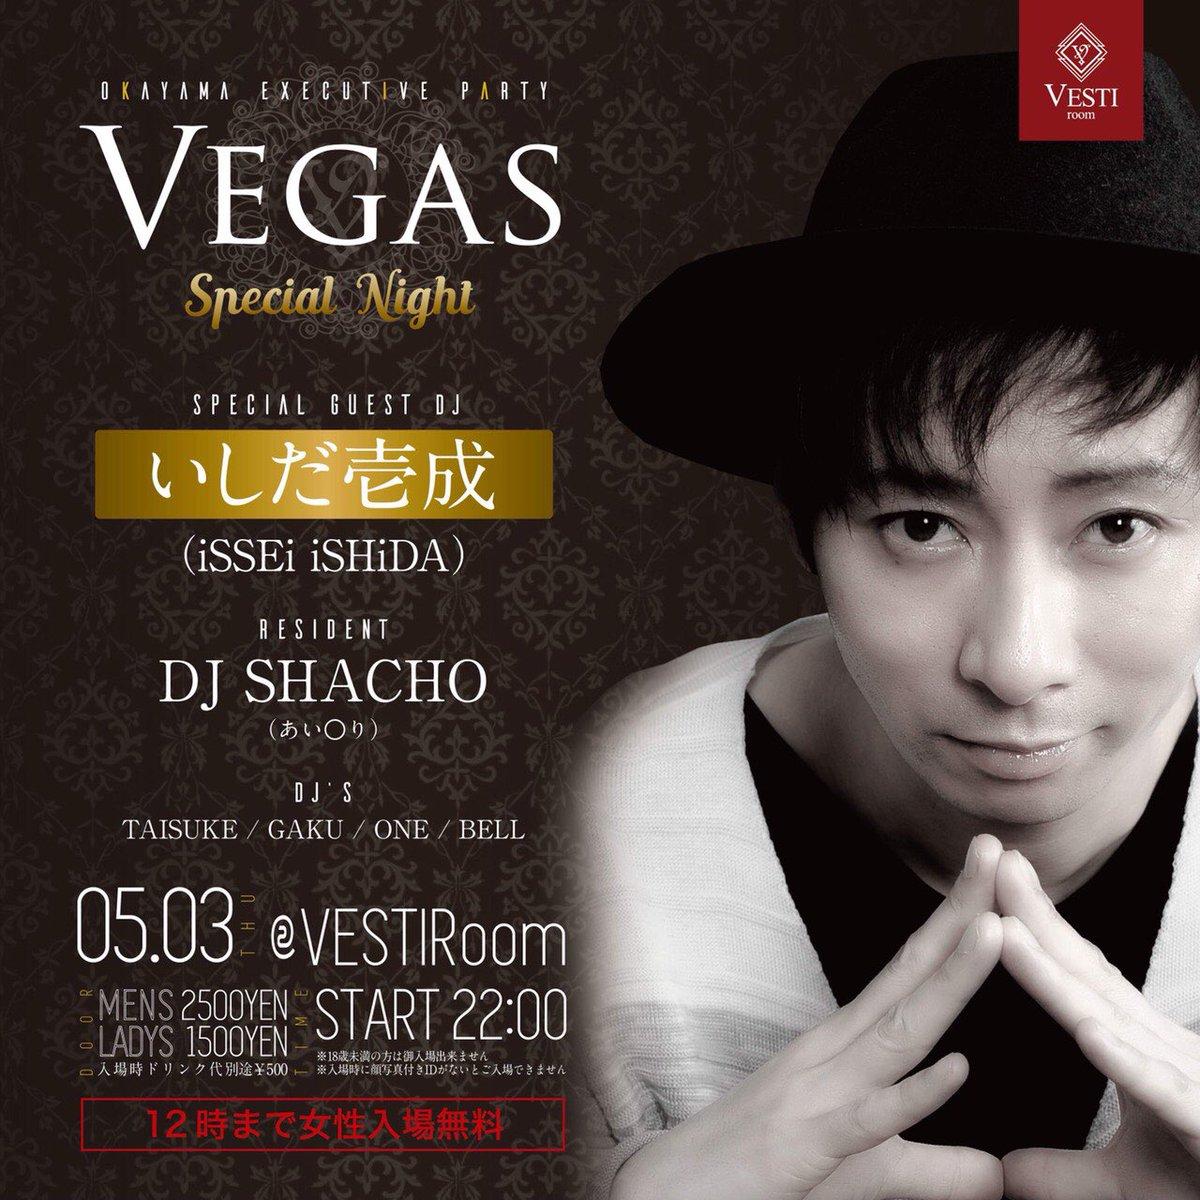 test ツイッターメディア - 5/3 (thu)  #VEGAS at @vestiroom   ⚜️special guest dj⚜️          いしだ壱成         ⚜️resident dj ⚜️          DJ SHACHO  GWもクラブで元気に遊びましょう! 僕自身、初のVEGASでのDJなので 是非遊びに来てください🙇🙇  #VESTI #VEGAS #GW https://t.co/Yruebjukxc